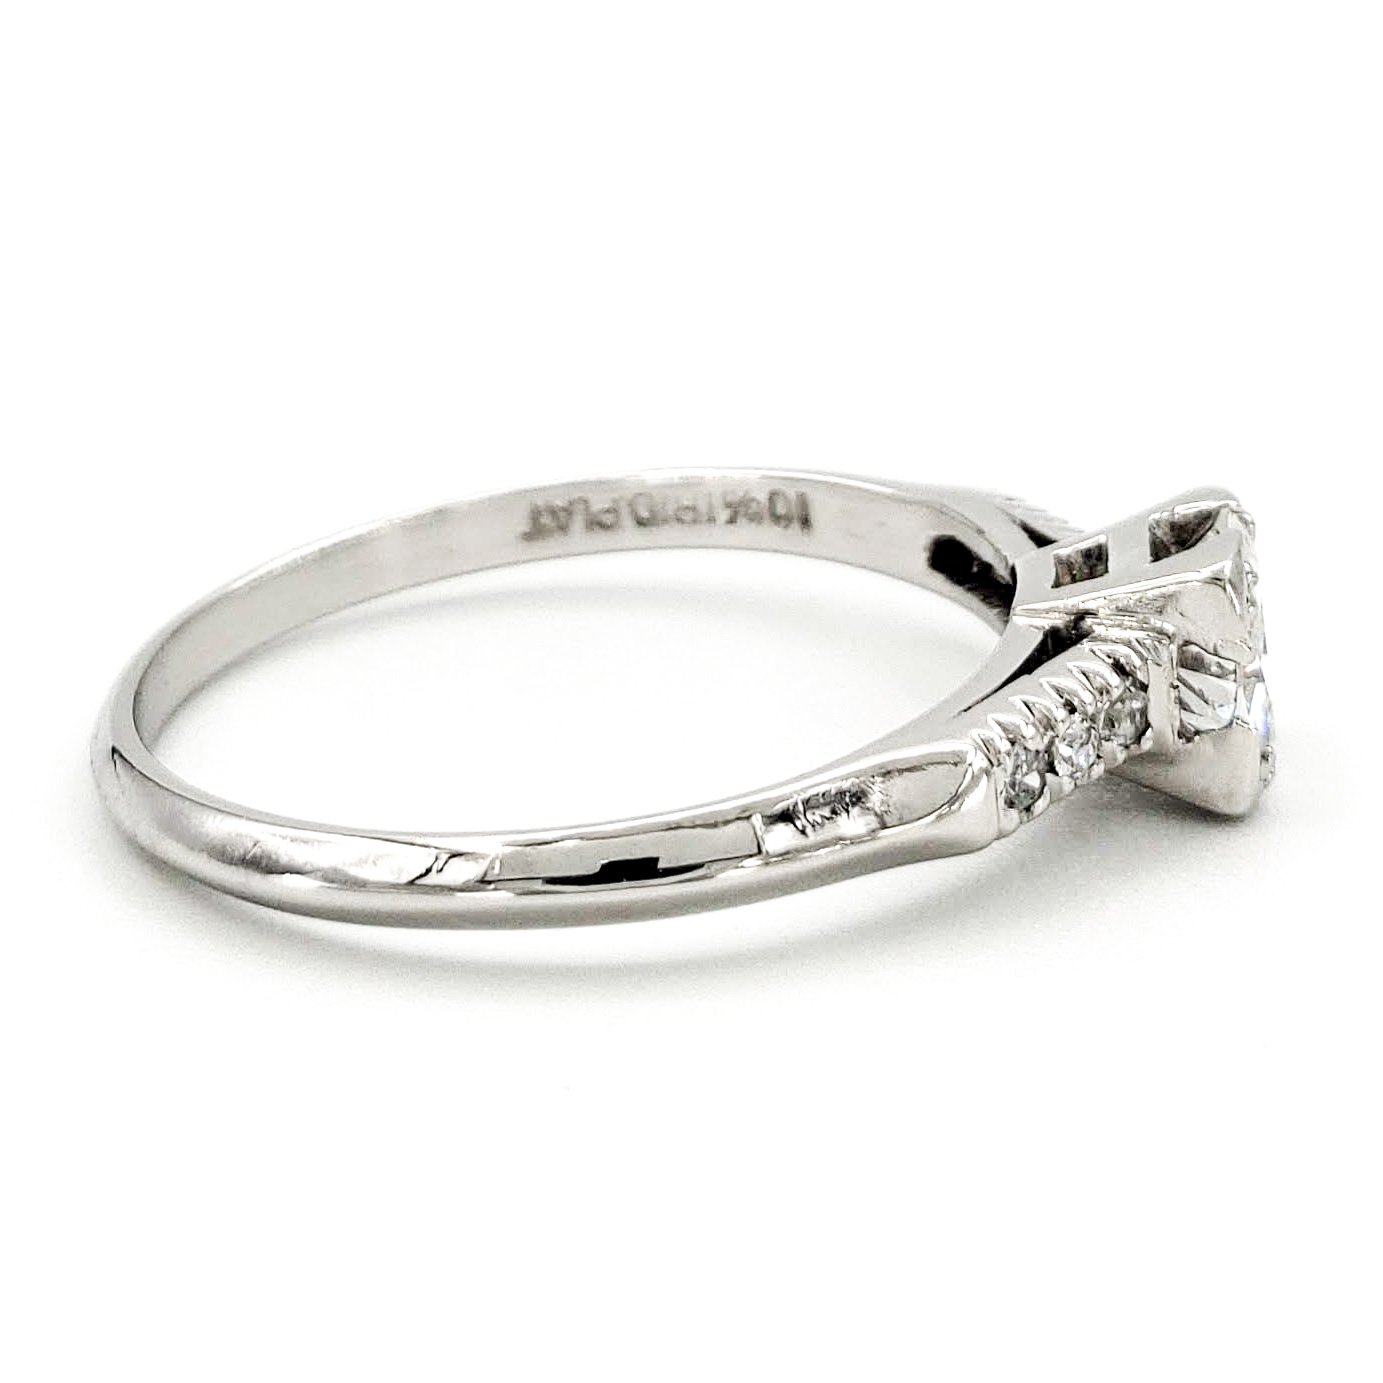 vintage-platinum-engagement-ring-with-0-43-carat-old-european-cut-diamond-egl-e-vs1